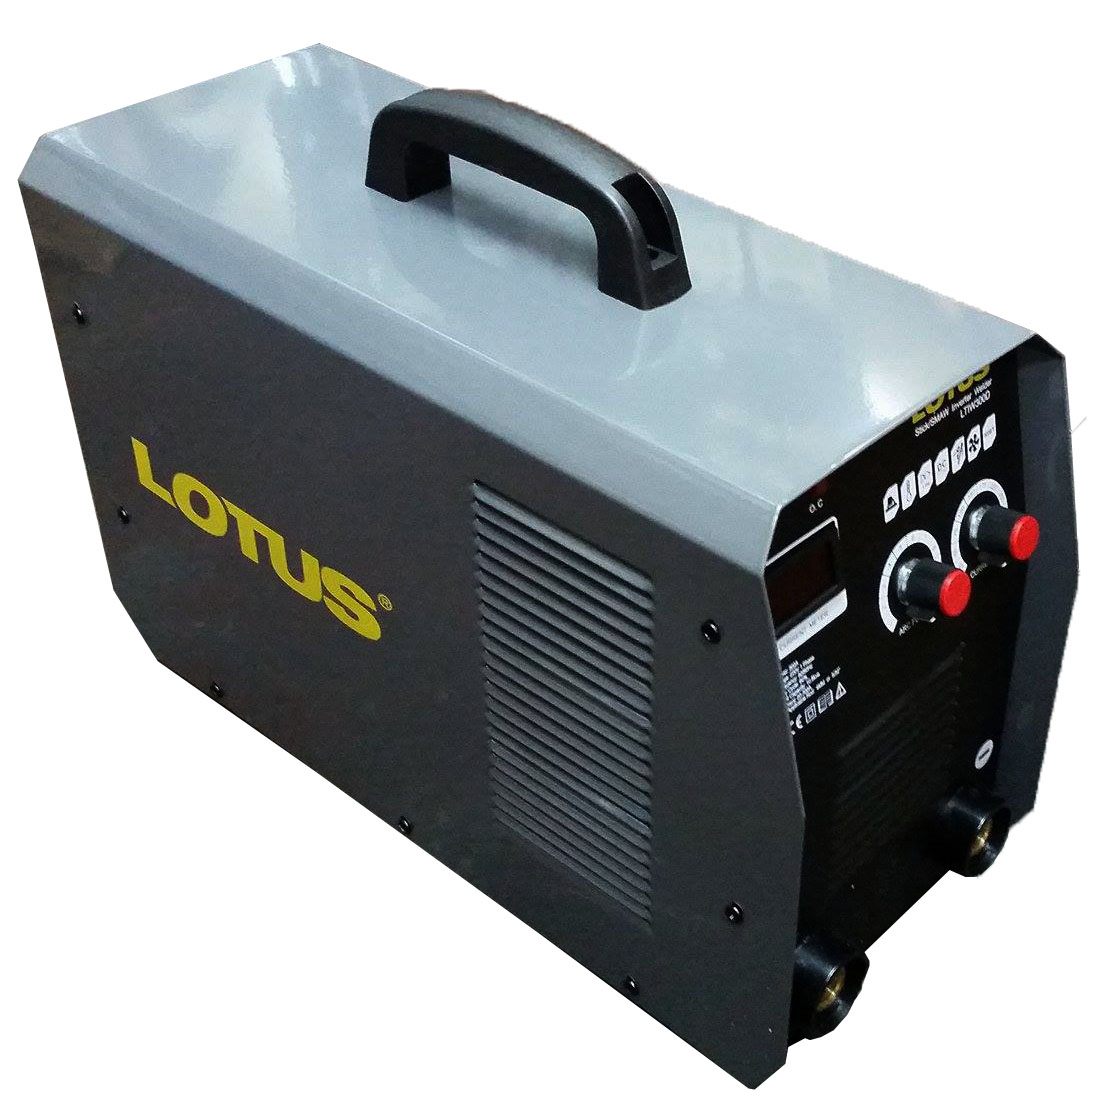 Lotus Ltiw300d Arc Inverter Welding Machine Powermark